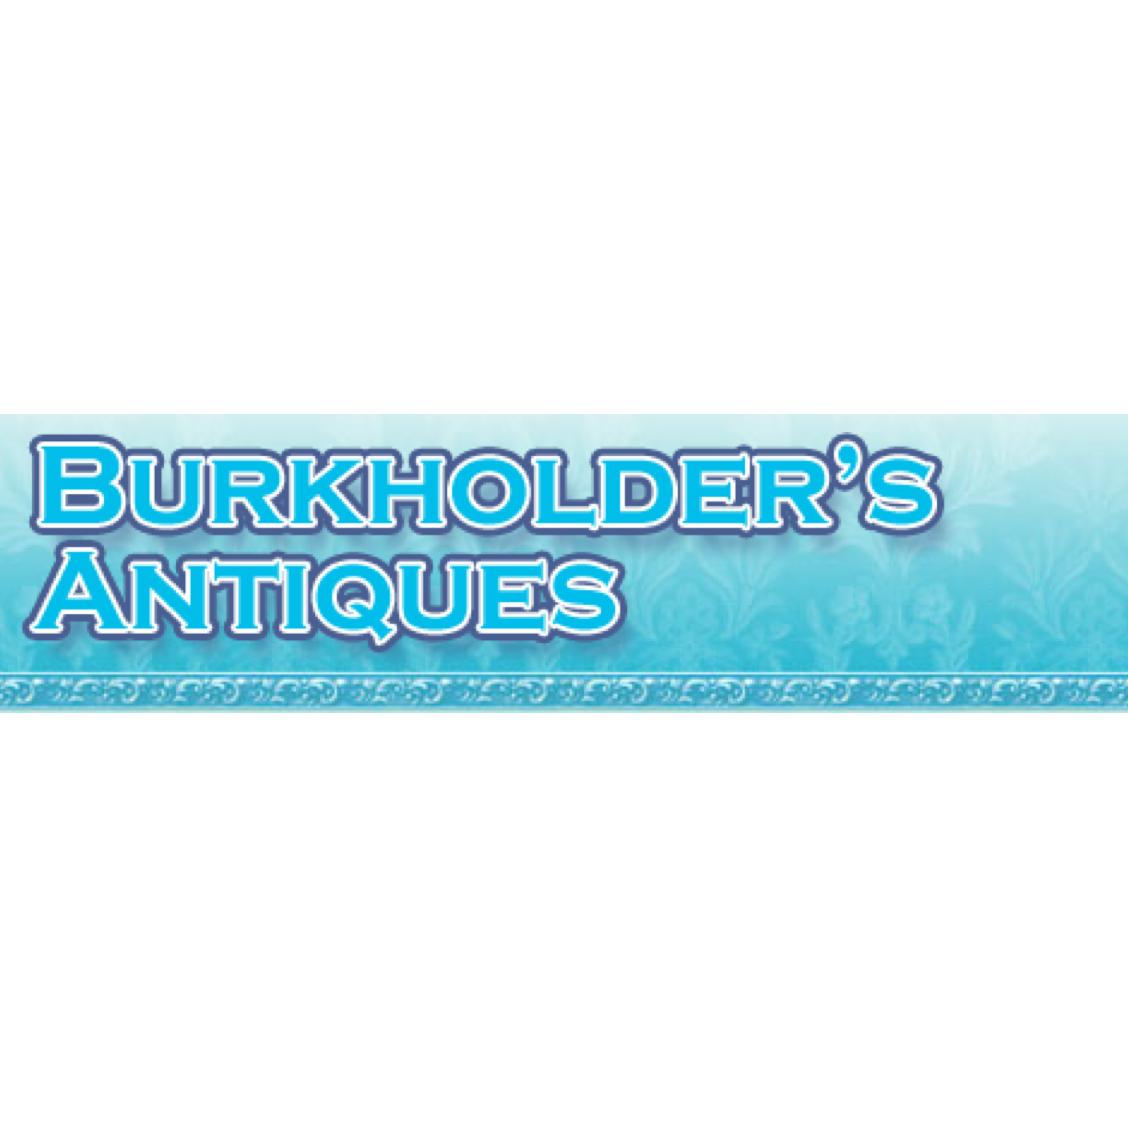 Burkholder's Antiques - Duncansville, PA - Art & Antique Stores, Restoration